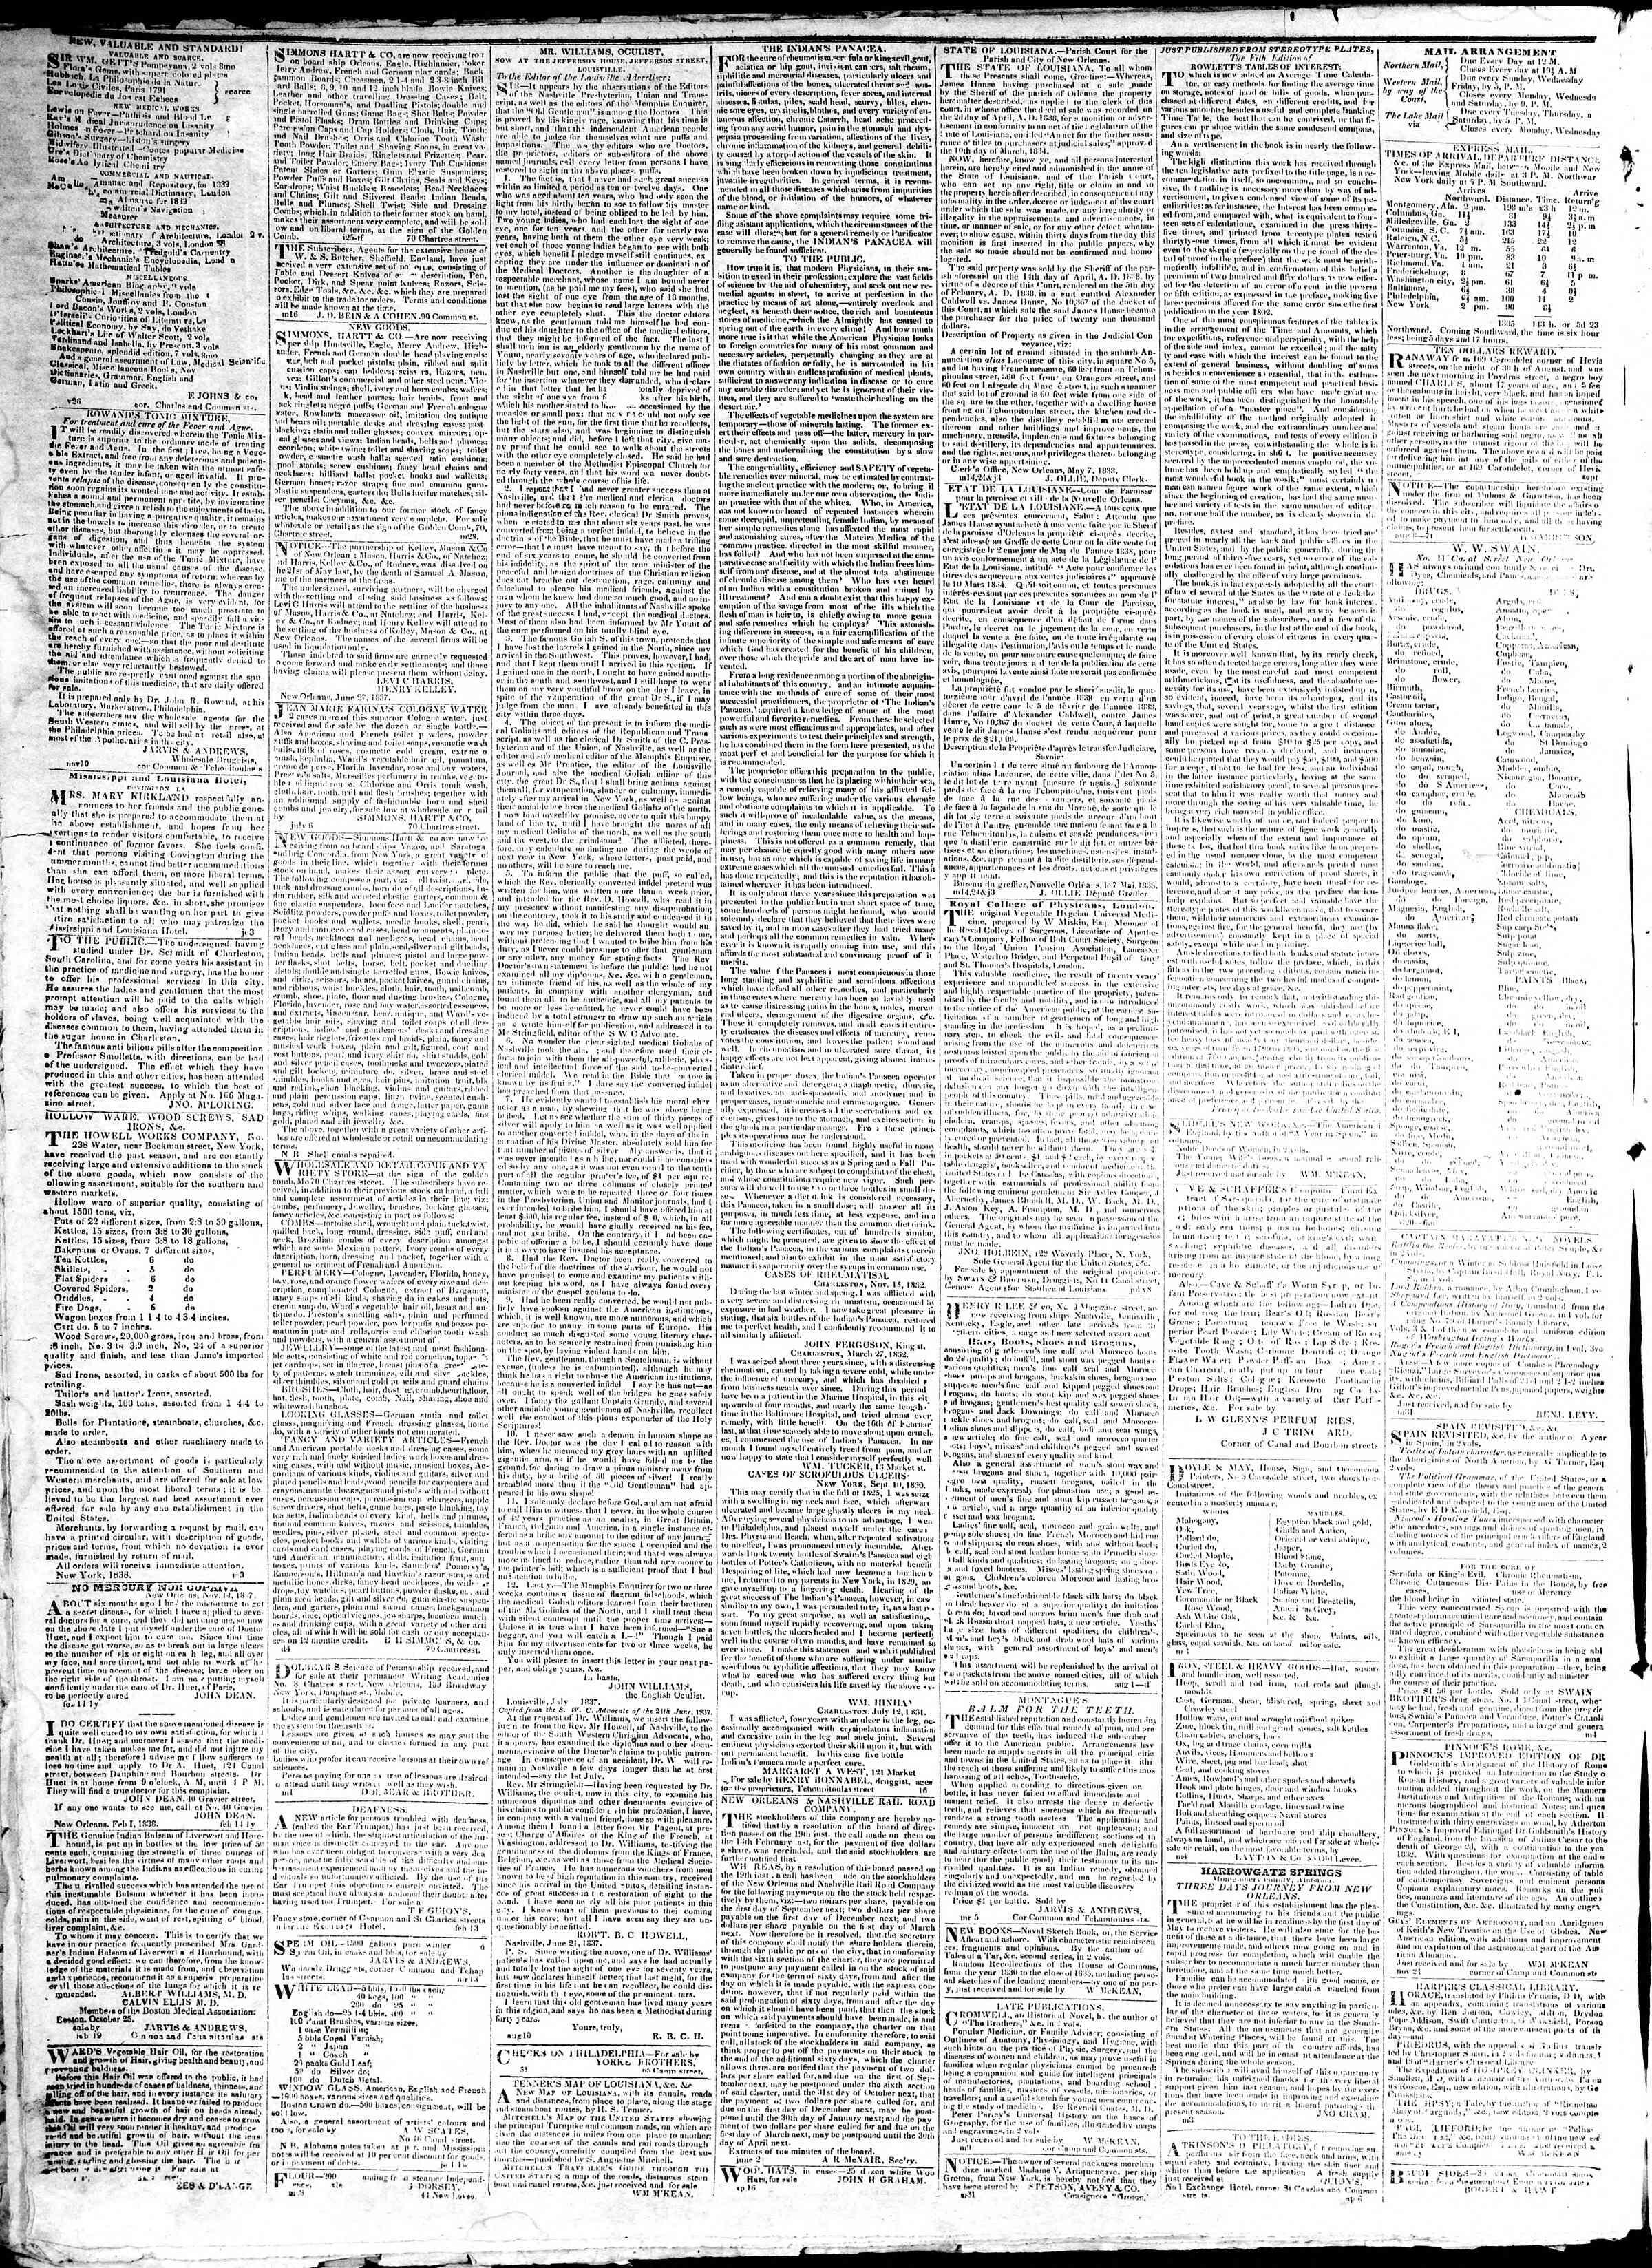 January 7, 1839 Tarihli True American Gazetesi Sayfa 4